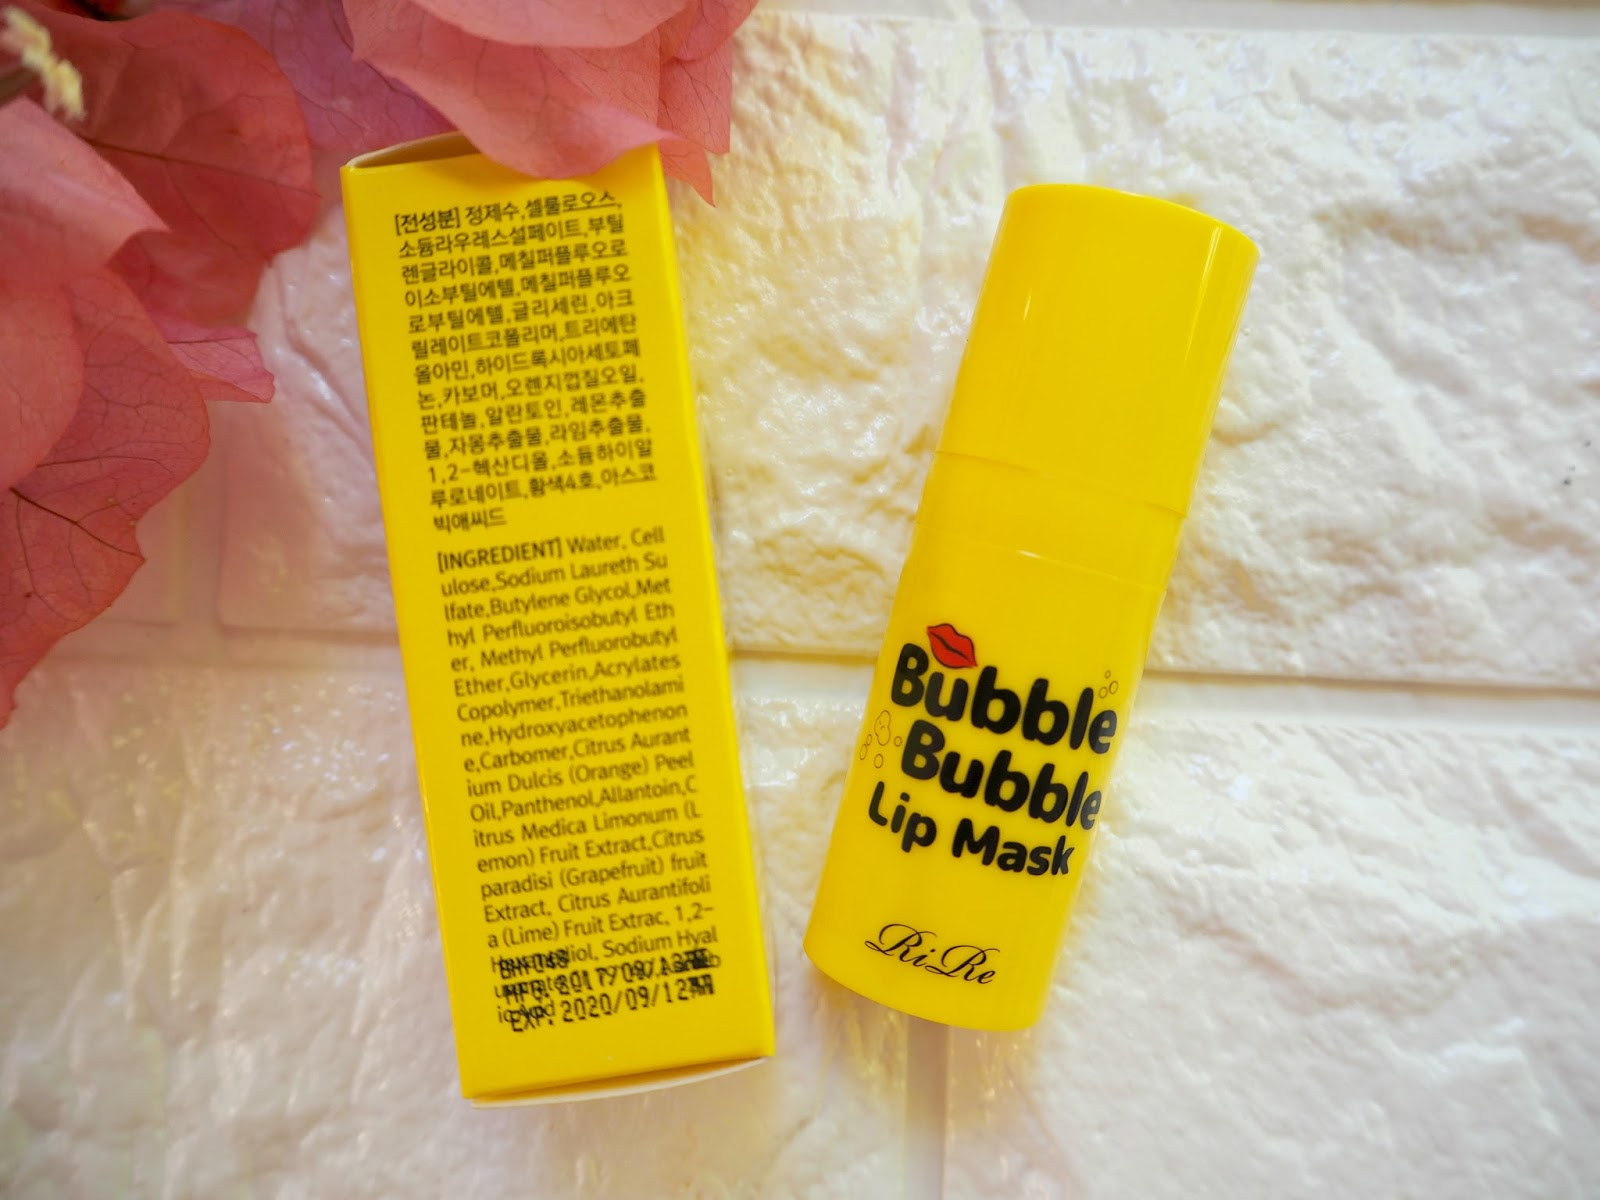 www.poshmakeupnstuff.blogspot.com: Rire Bubble Bubble Lip Mask